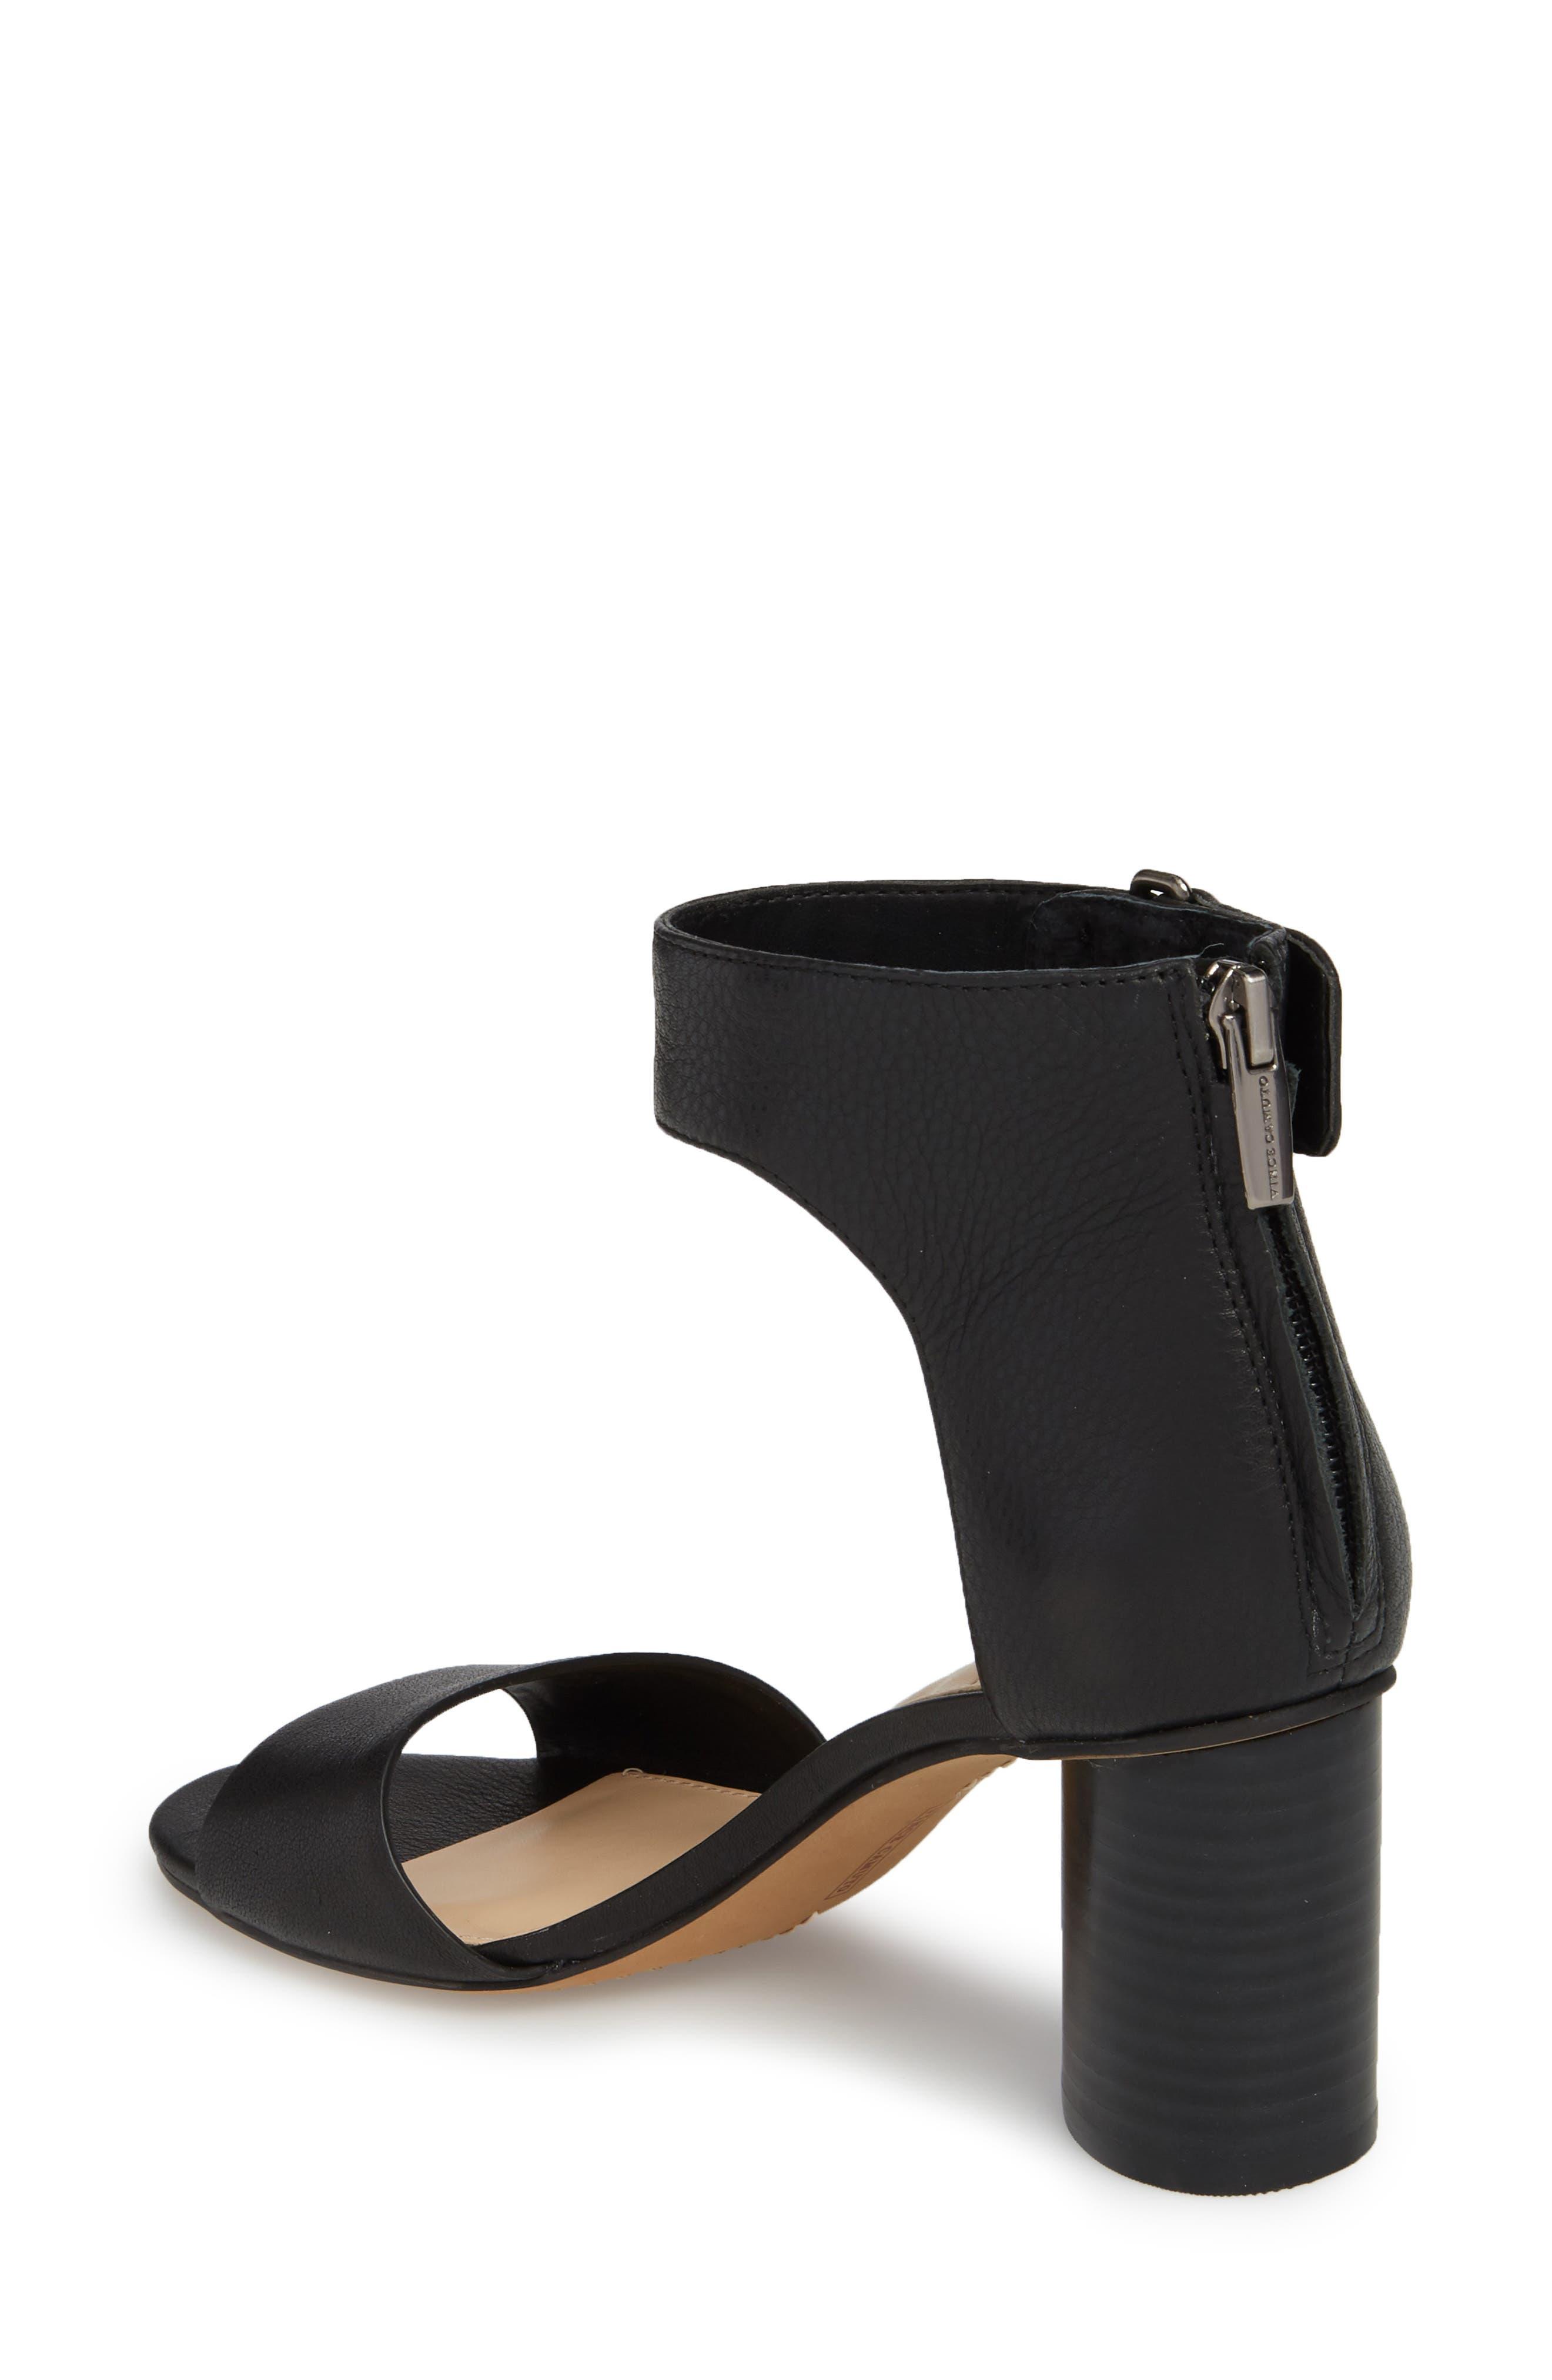 Jannali Ankle Strap Sandal,                             Alternate thumbnail 2, color,                             BLACK LEATHER